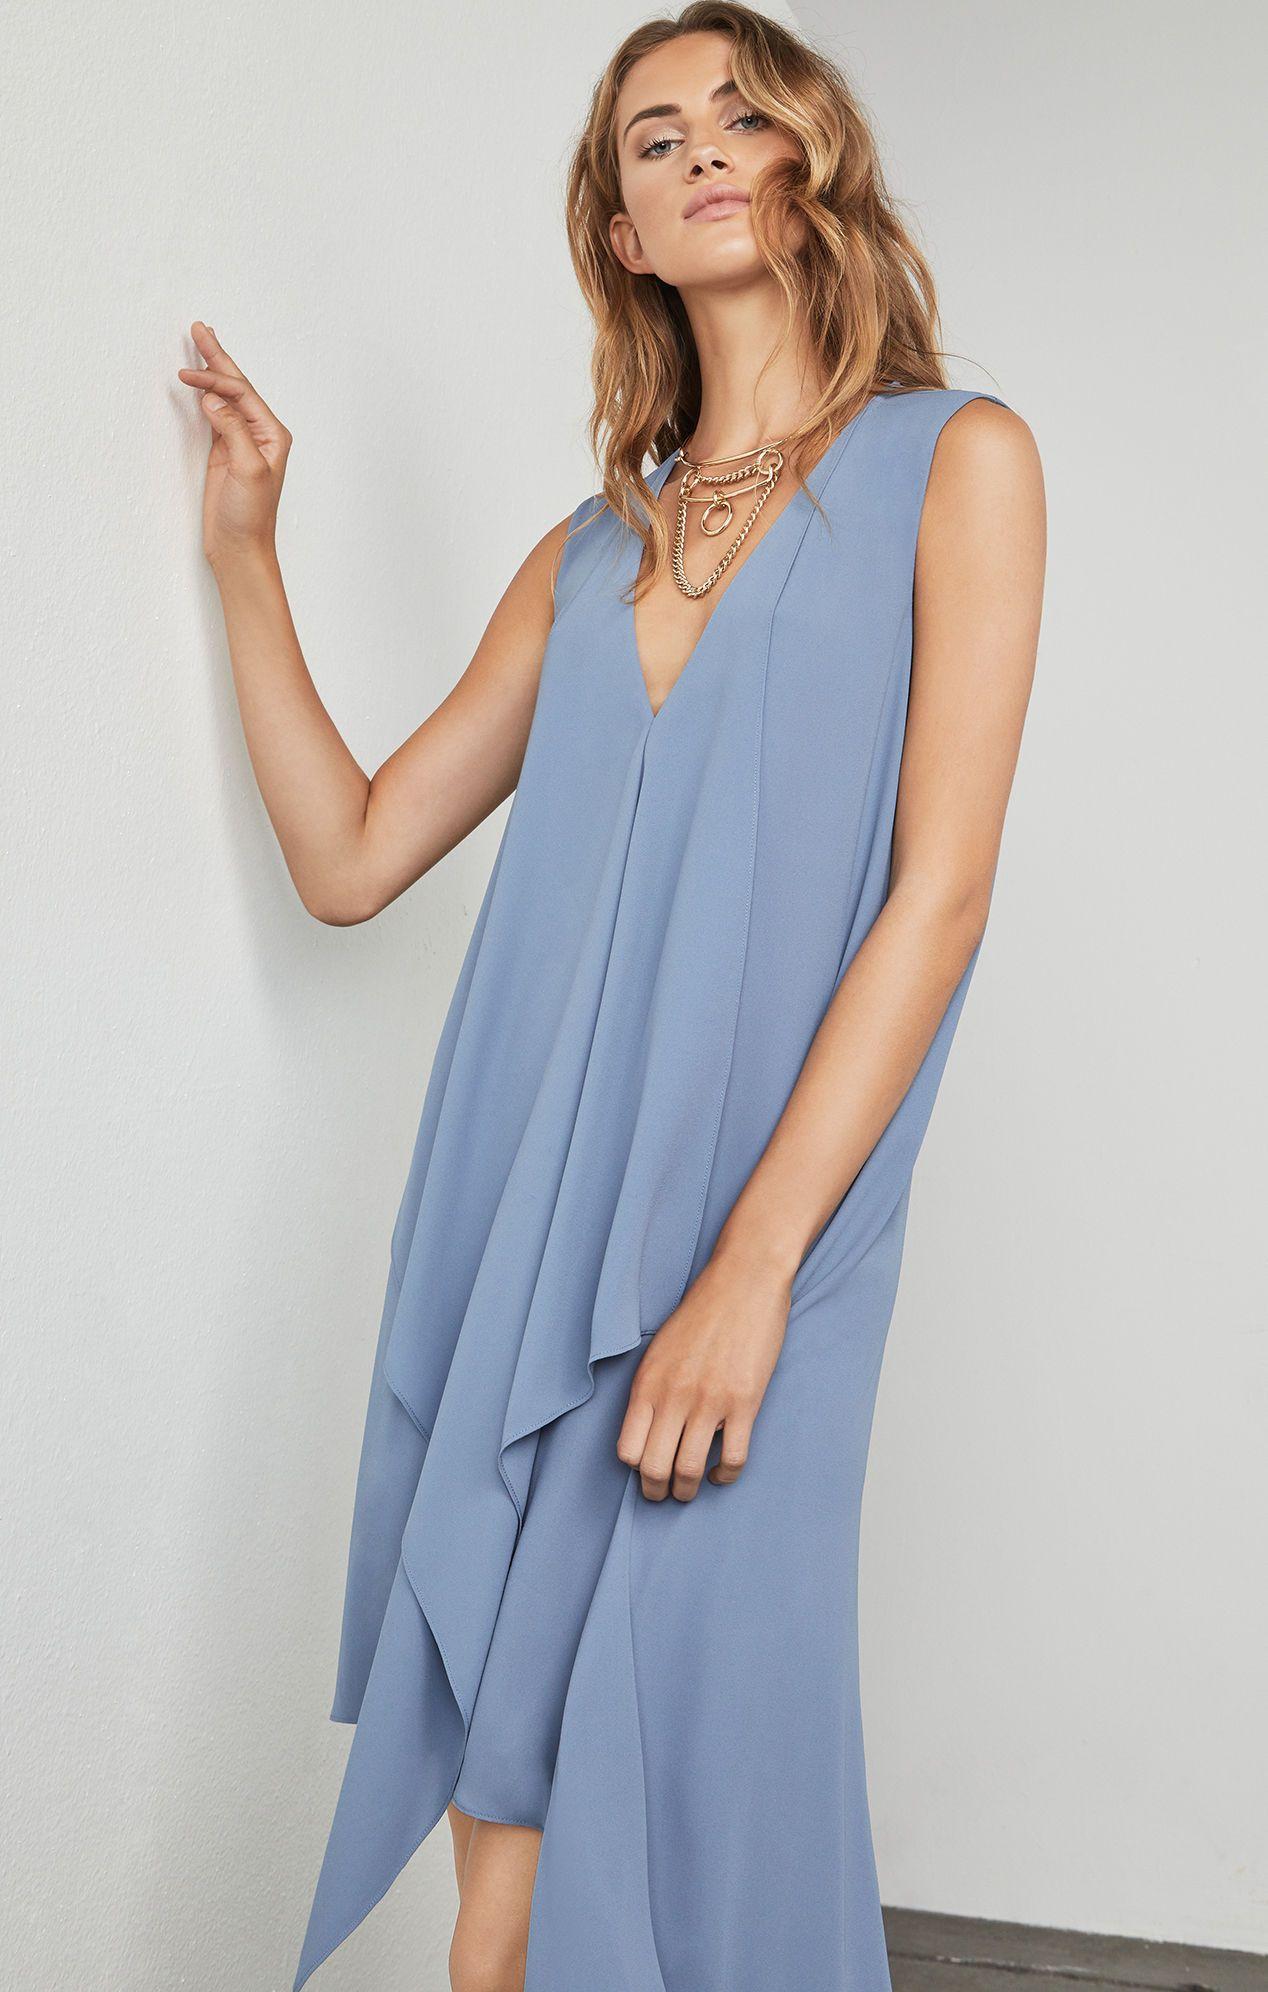 Long sleeveless light blue simple bridesmaid dress